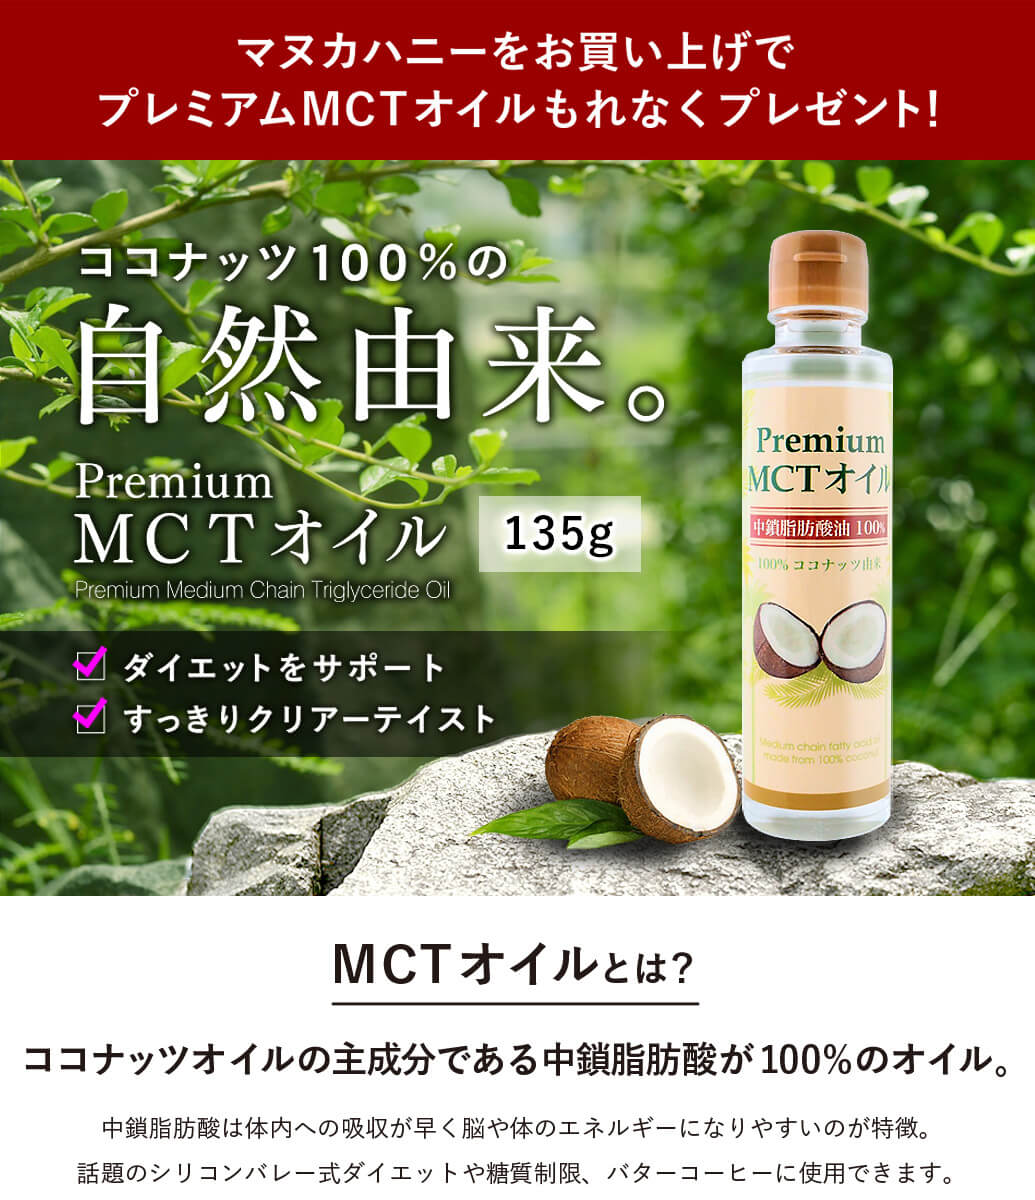 MCTオイルプレゼント